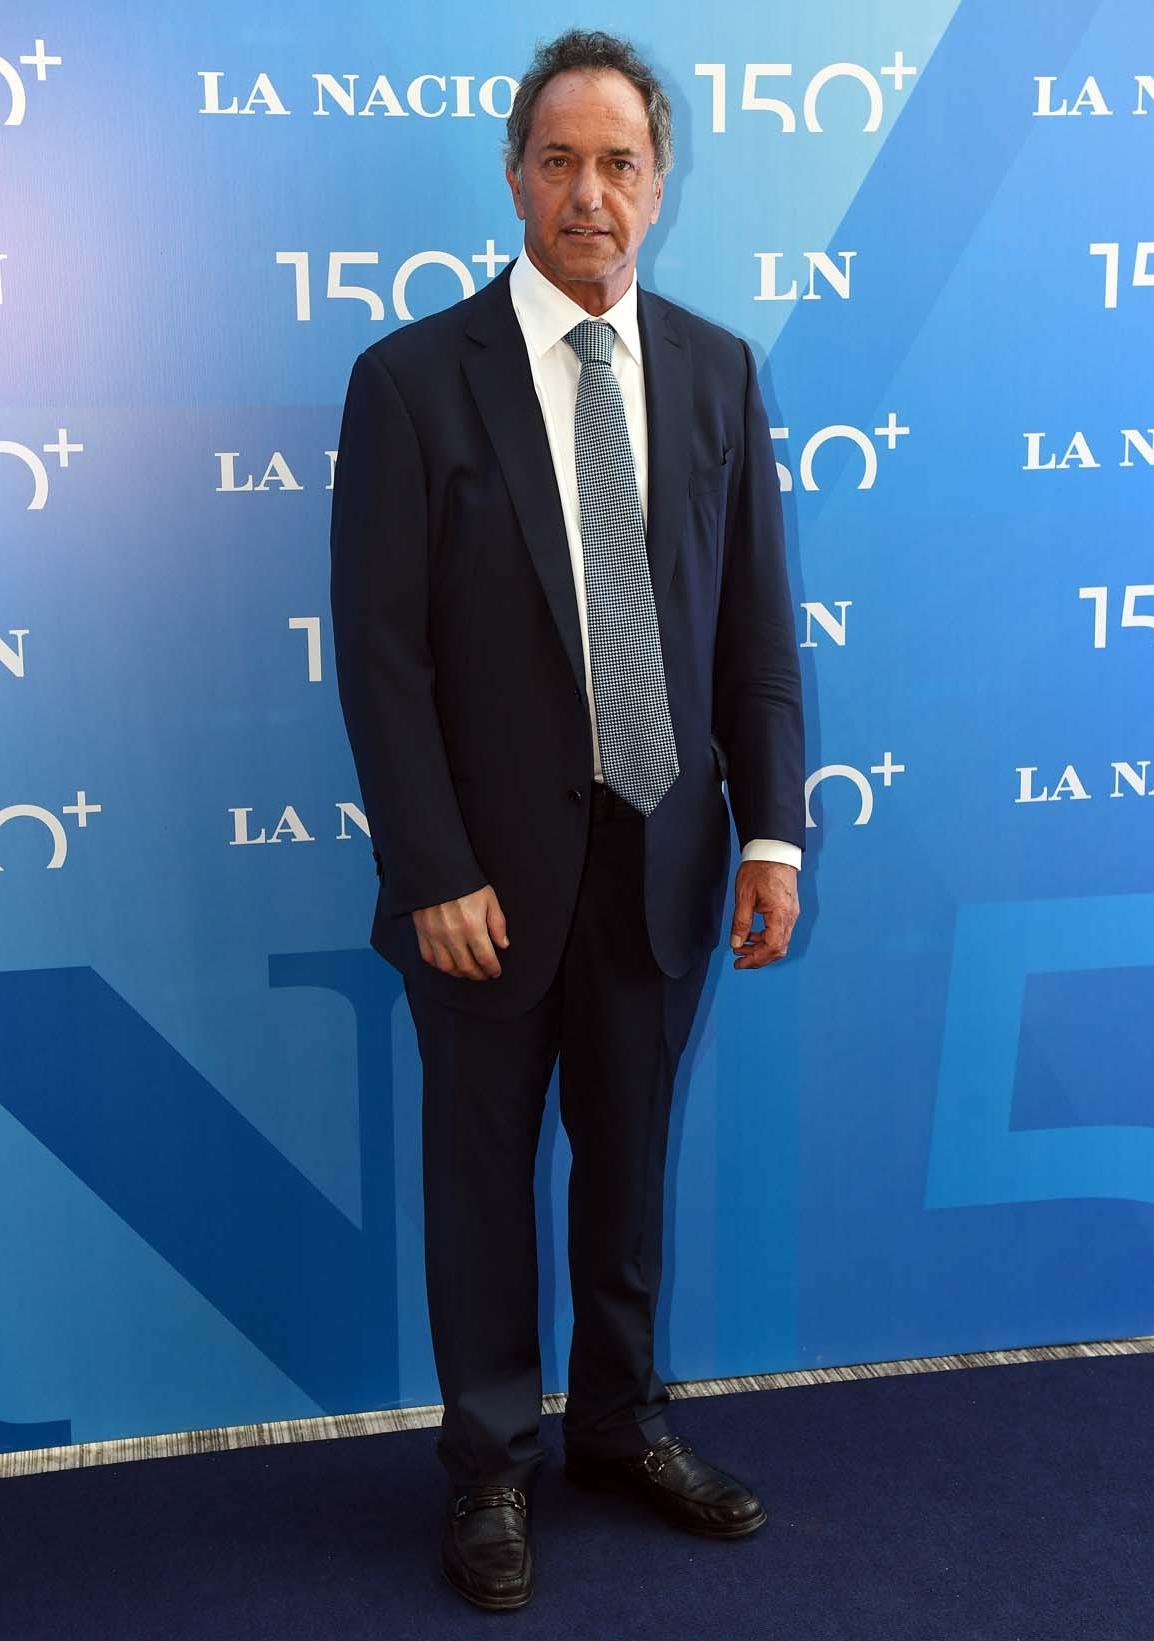 El diputado Daniel Scioli